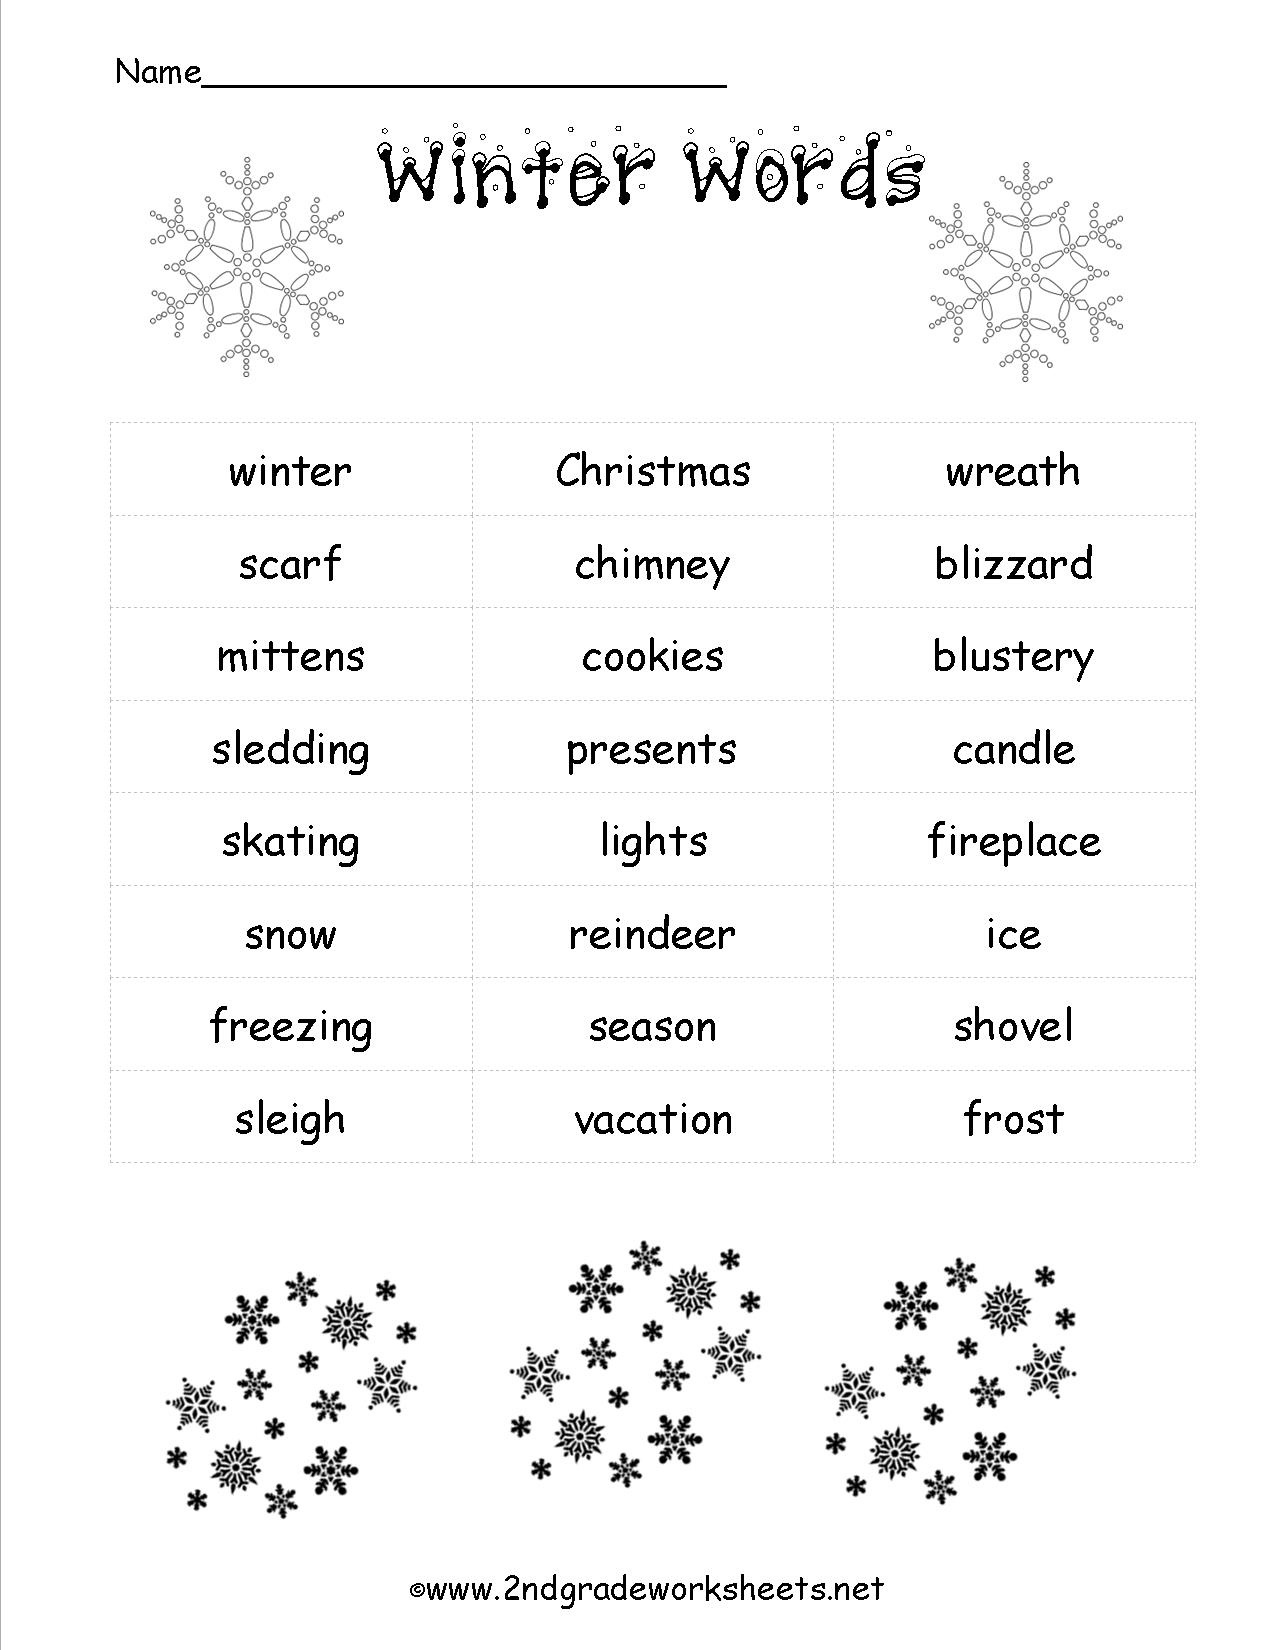 Christmas Worksheets And Printouts - Christmas Fun Worksheets Printable Free